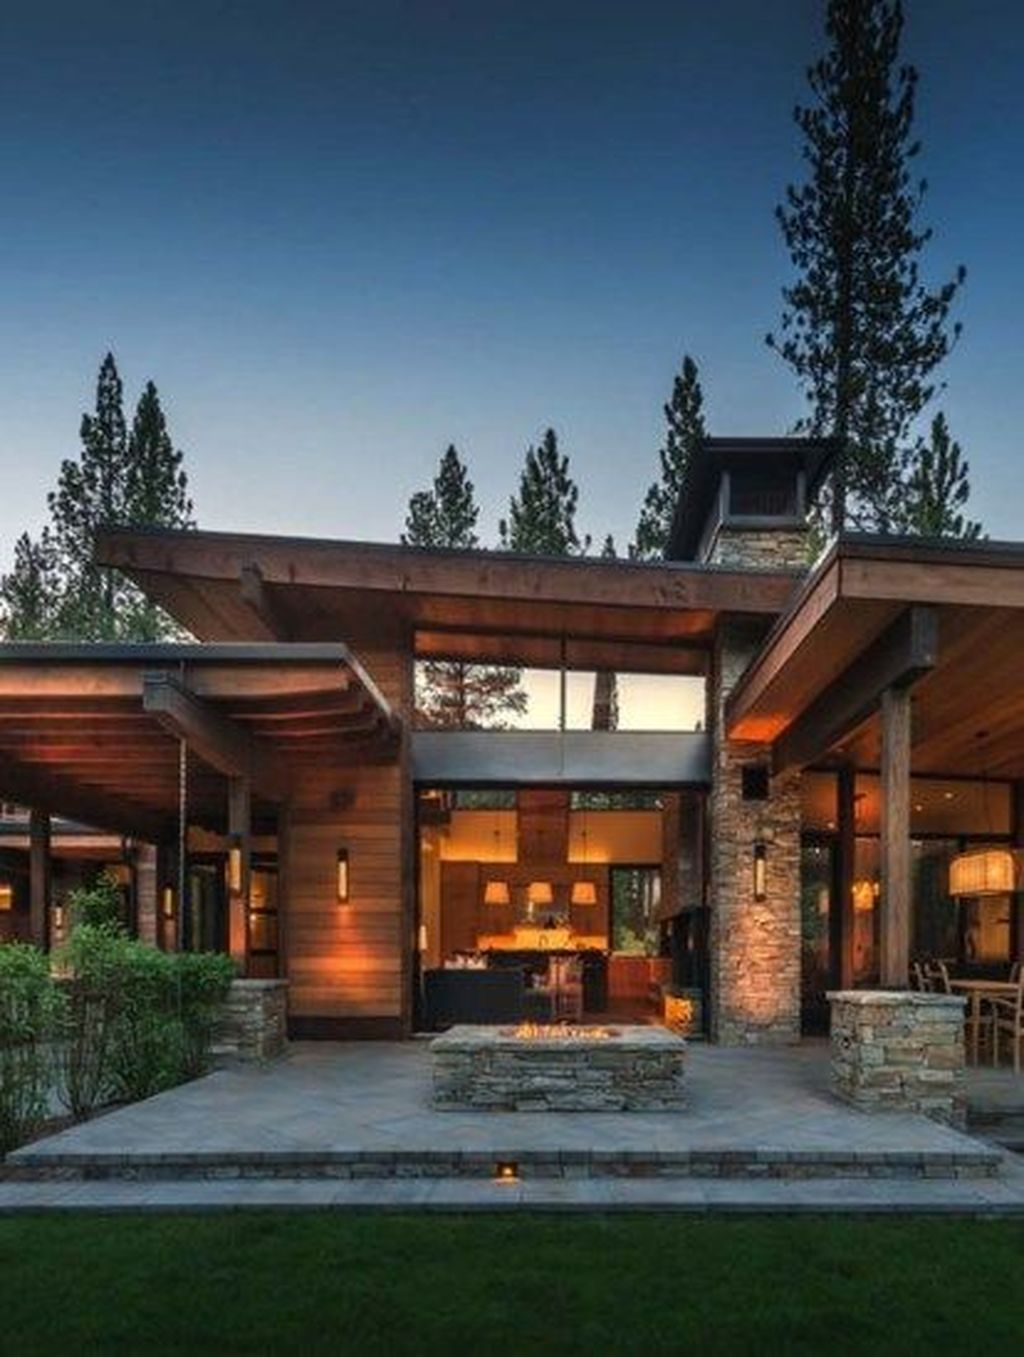 36 Lovely Modern Home Exterior Design Ideas Modern Mountain Home Modern House Exterior House Designs Exterior